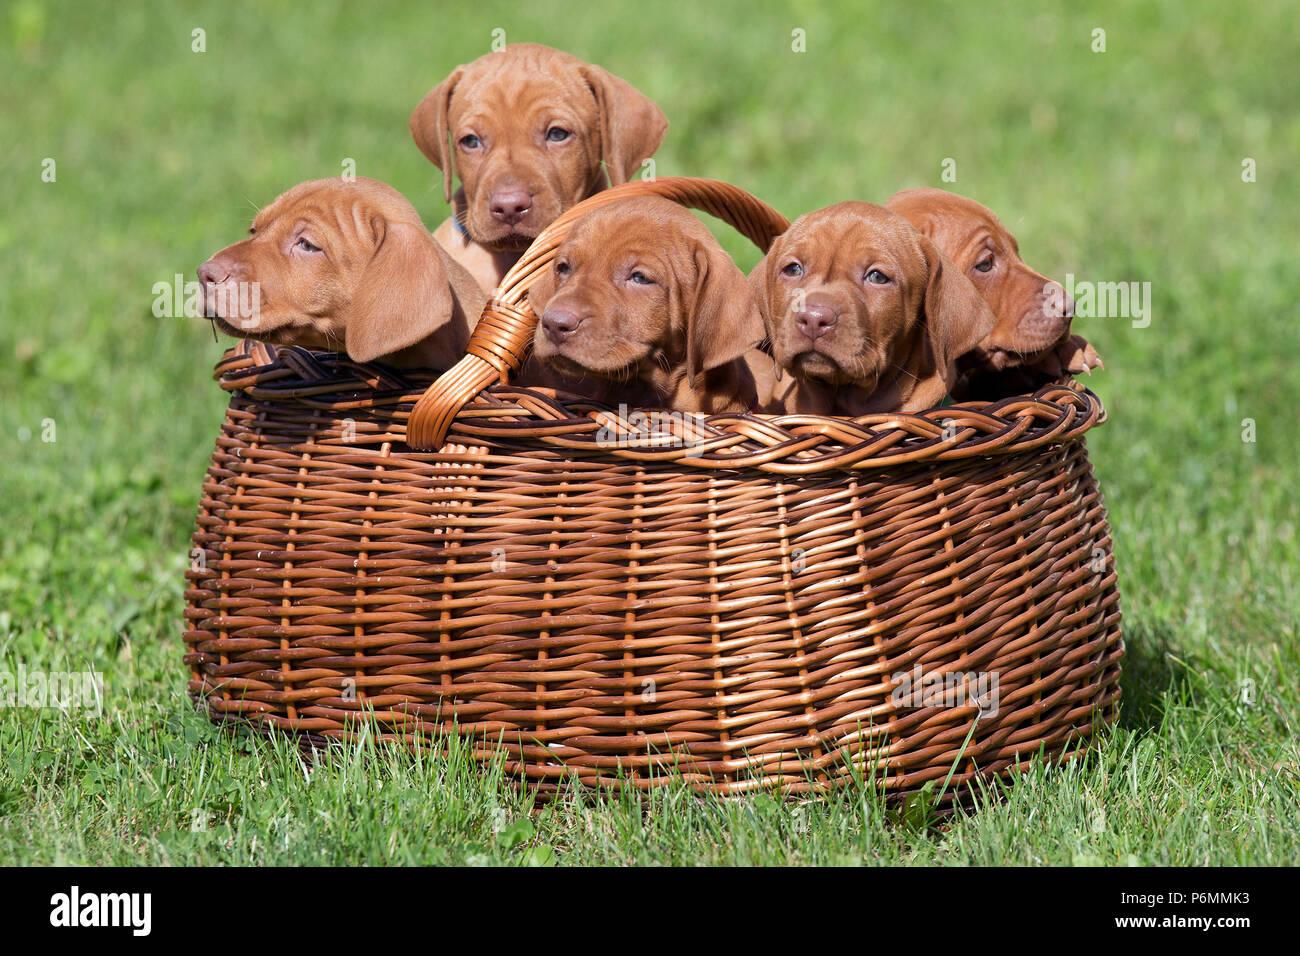 Neuenhagen, Germany, Magyar Vizsla Dog puppies are sitting in a bast basket - Stock Image